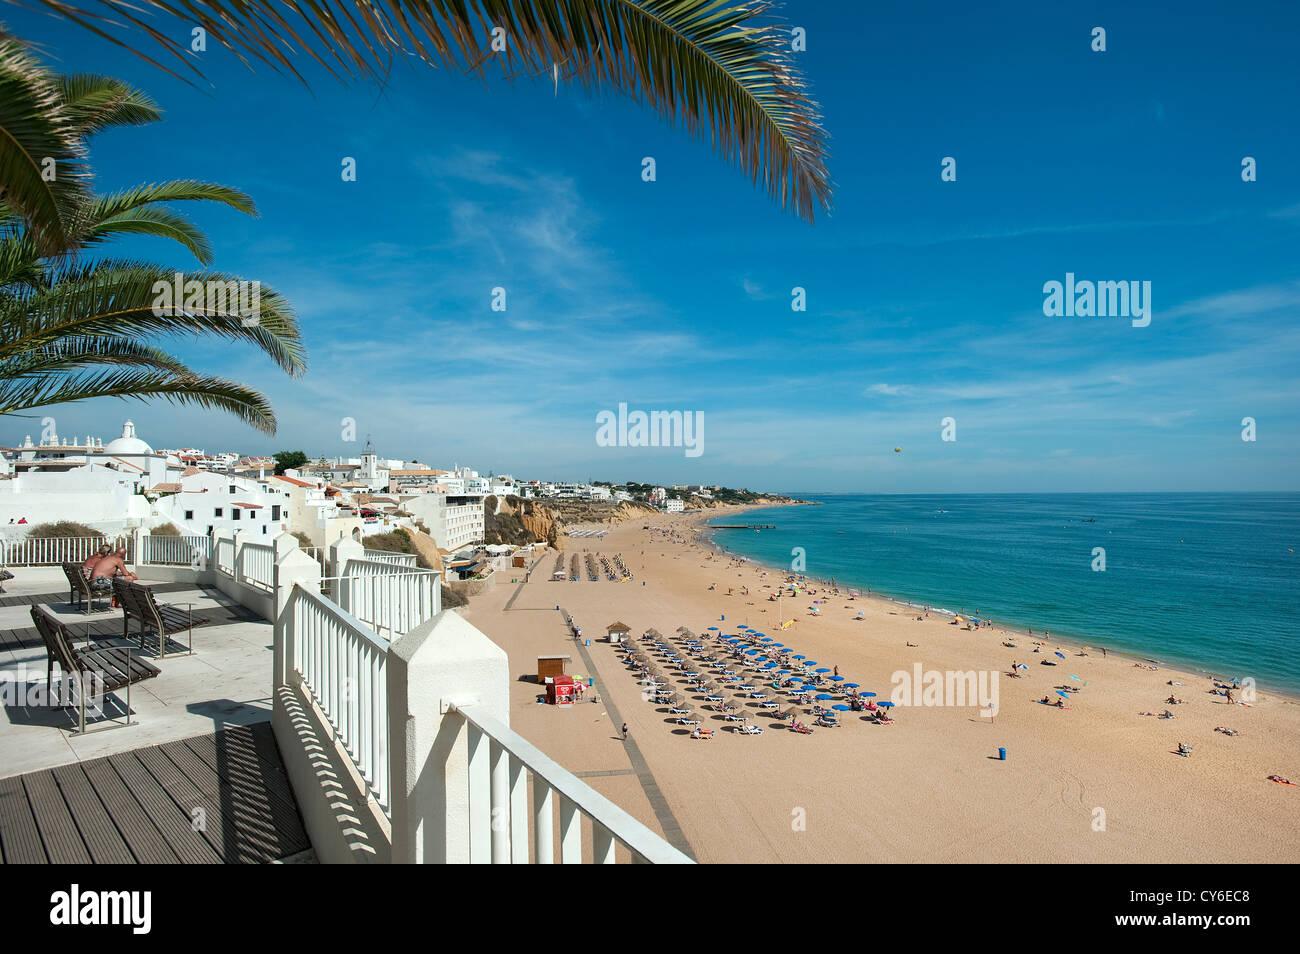 Praia Peneco Beach, Albufeira, Algarve, Portugal - Stock Image